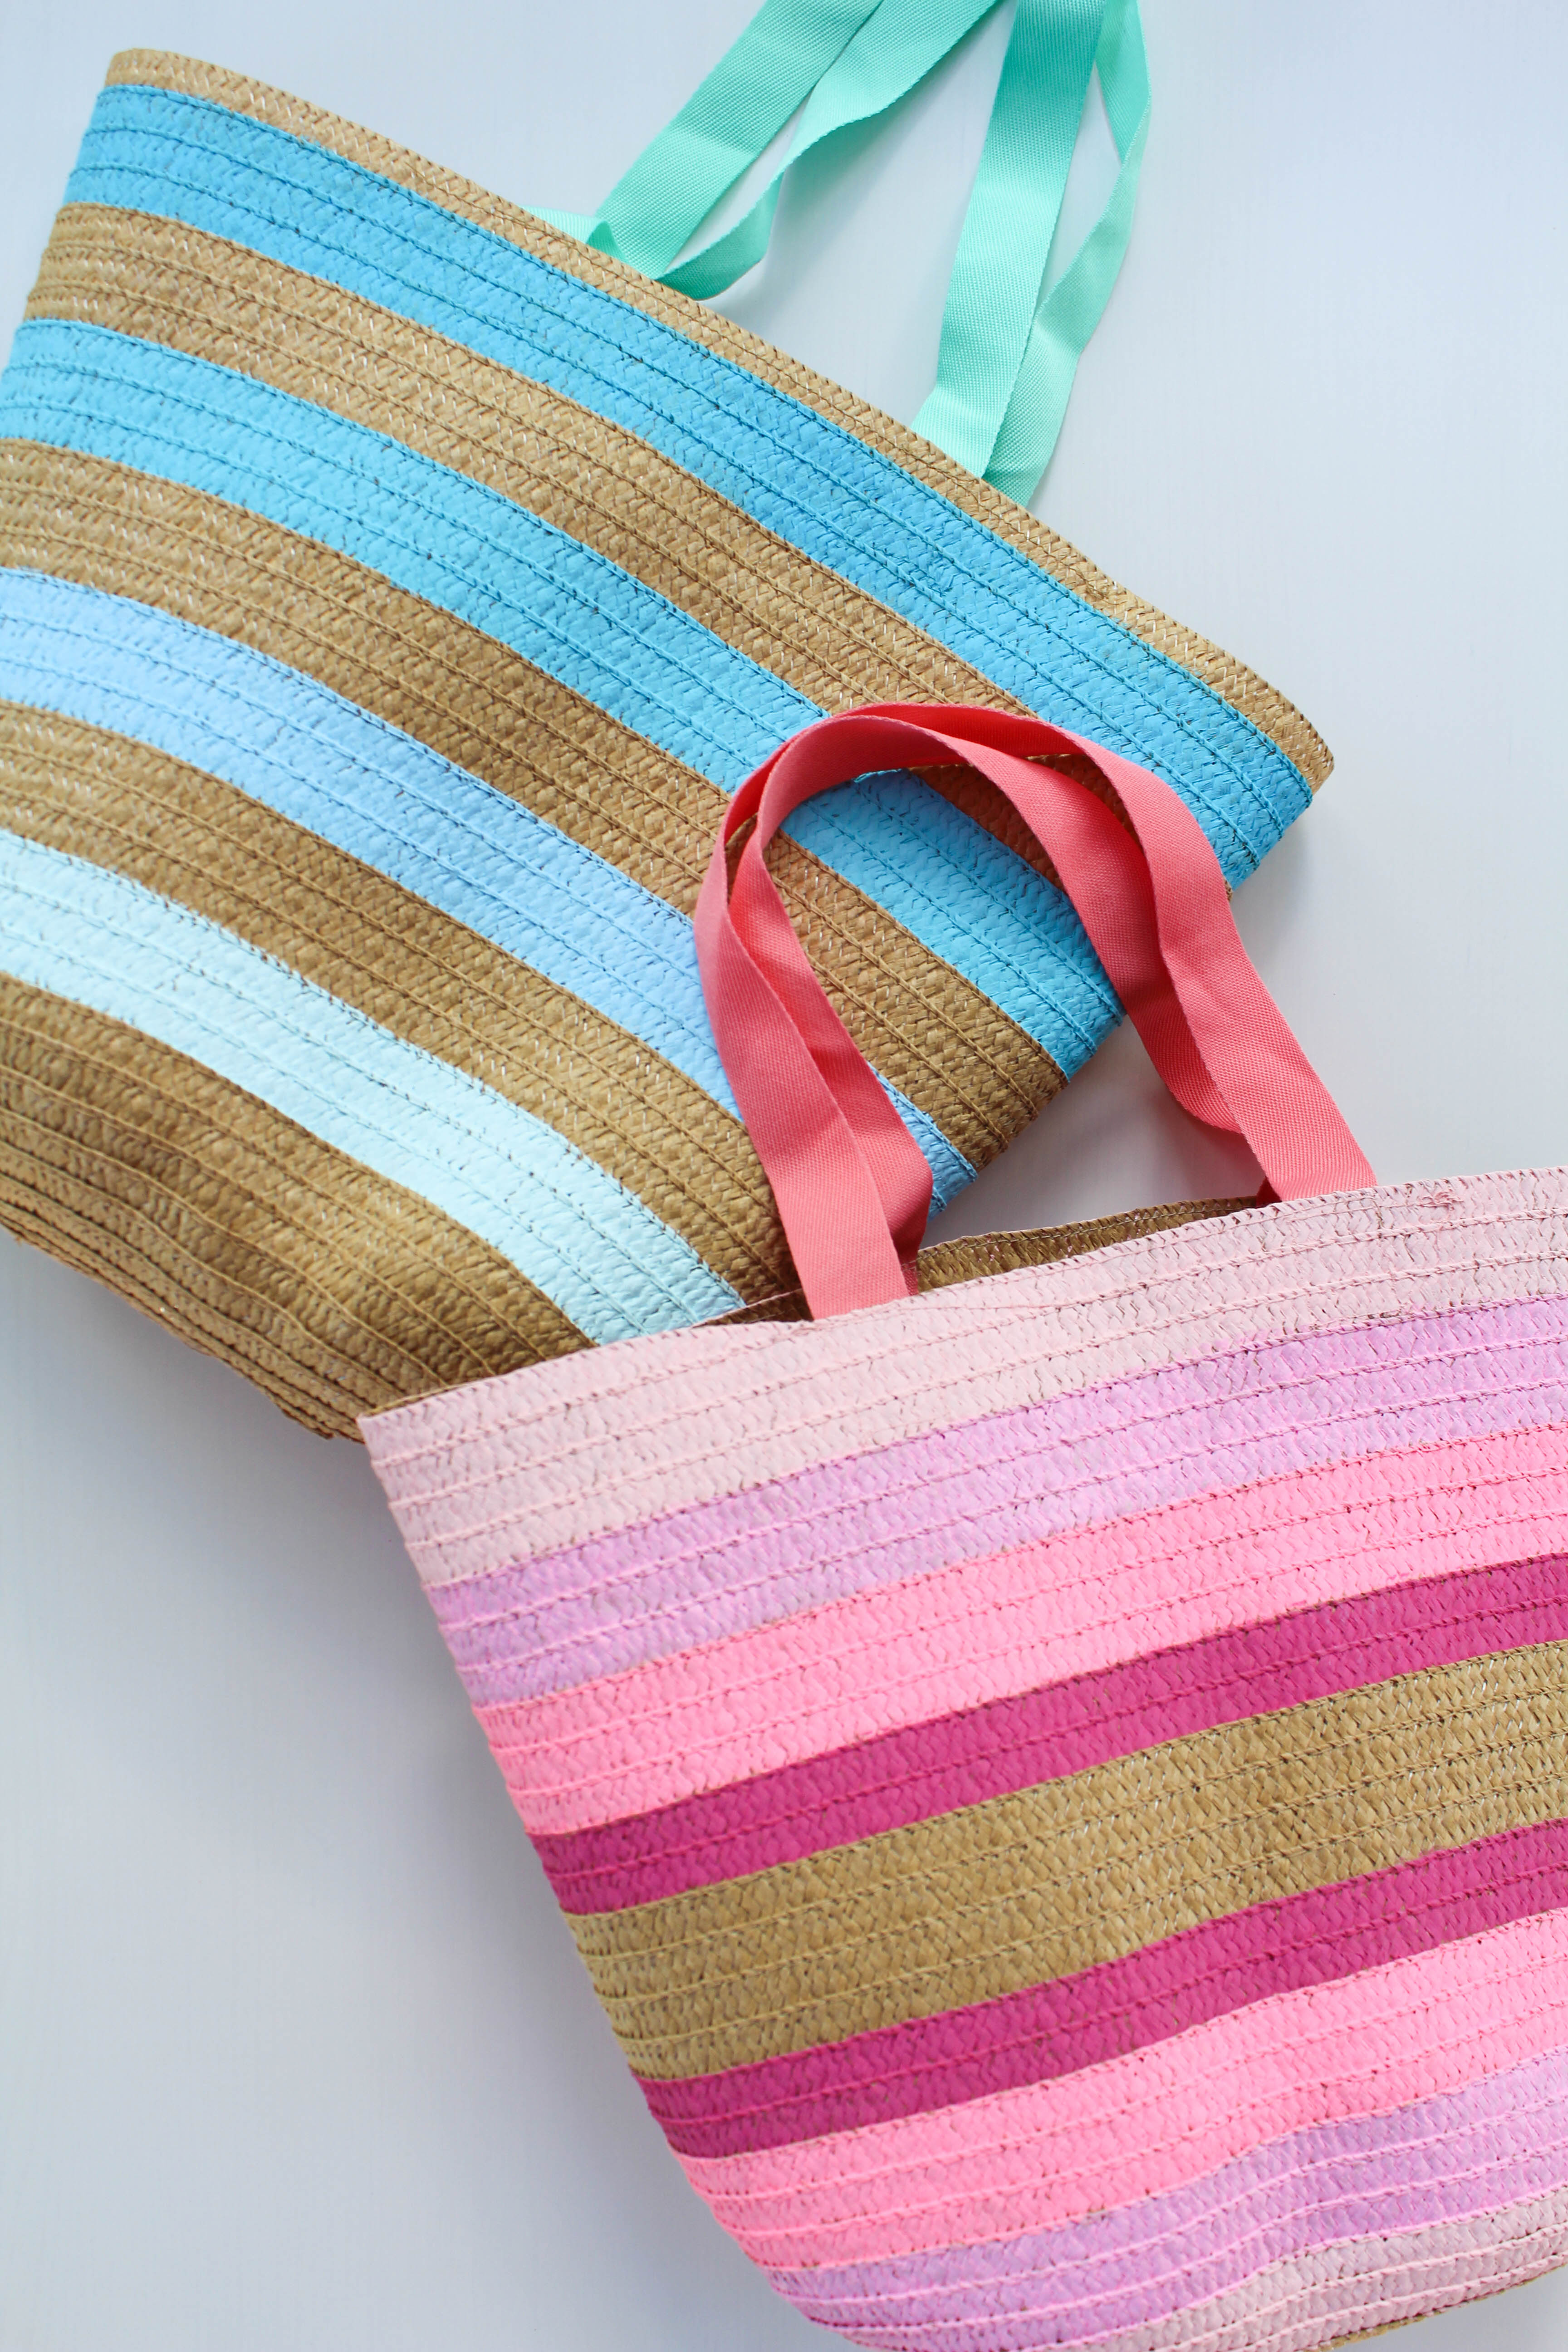 DIY Ombre Tote Bag - Let's Mingle Blog